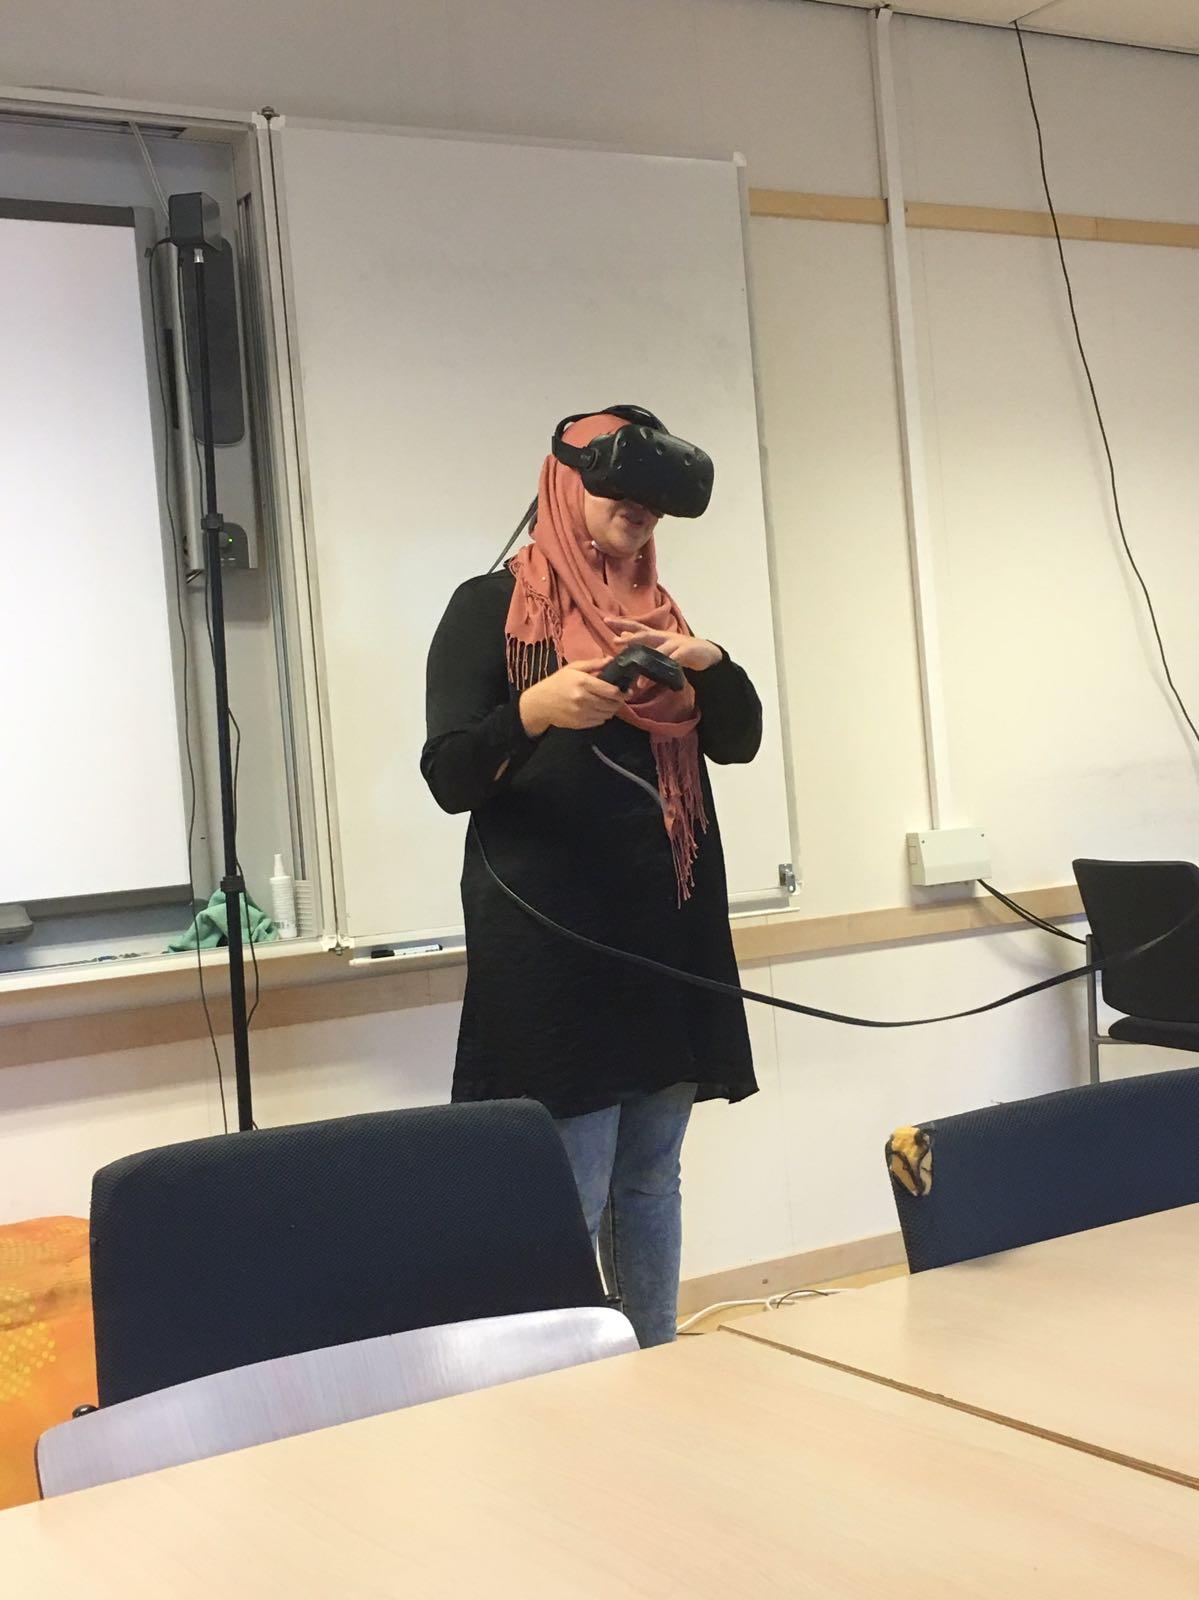 2017 11 14 PHOTO 00000003 - 14 nov: Innovatieve VWO'ers en docenten @ Lumion